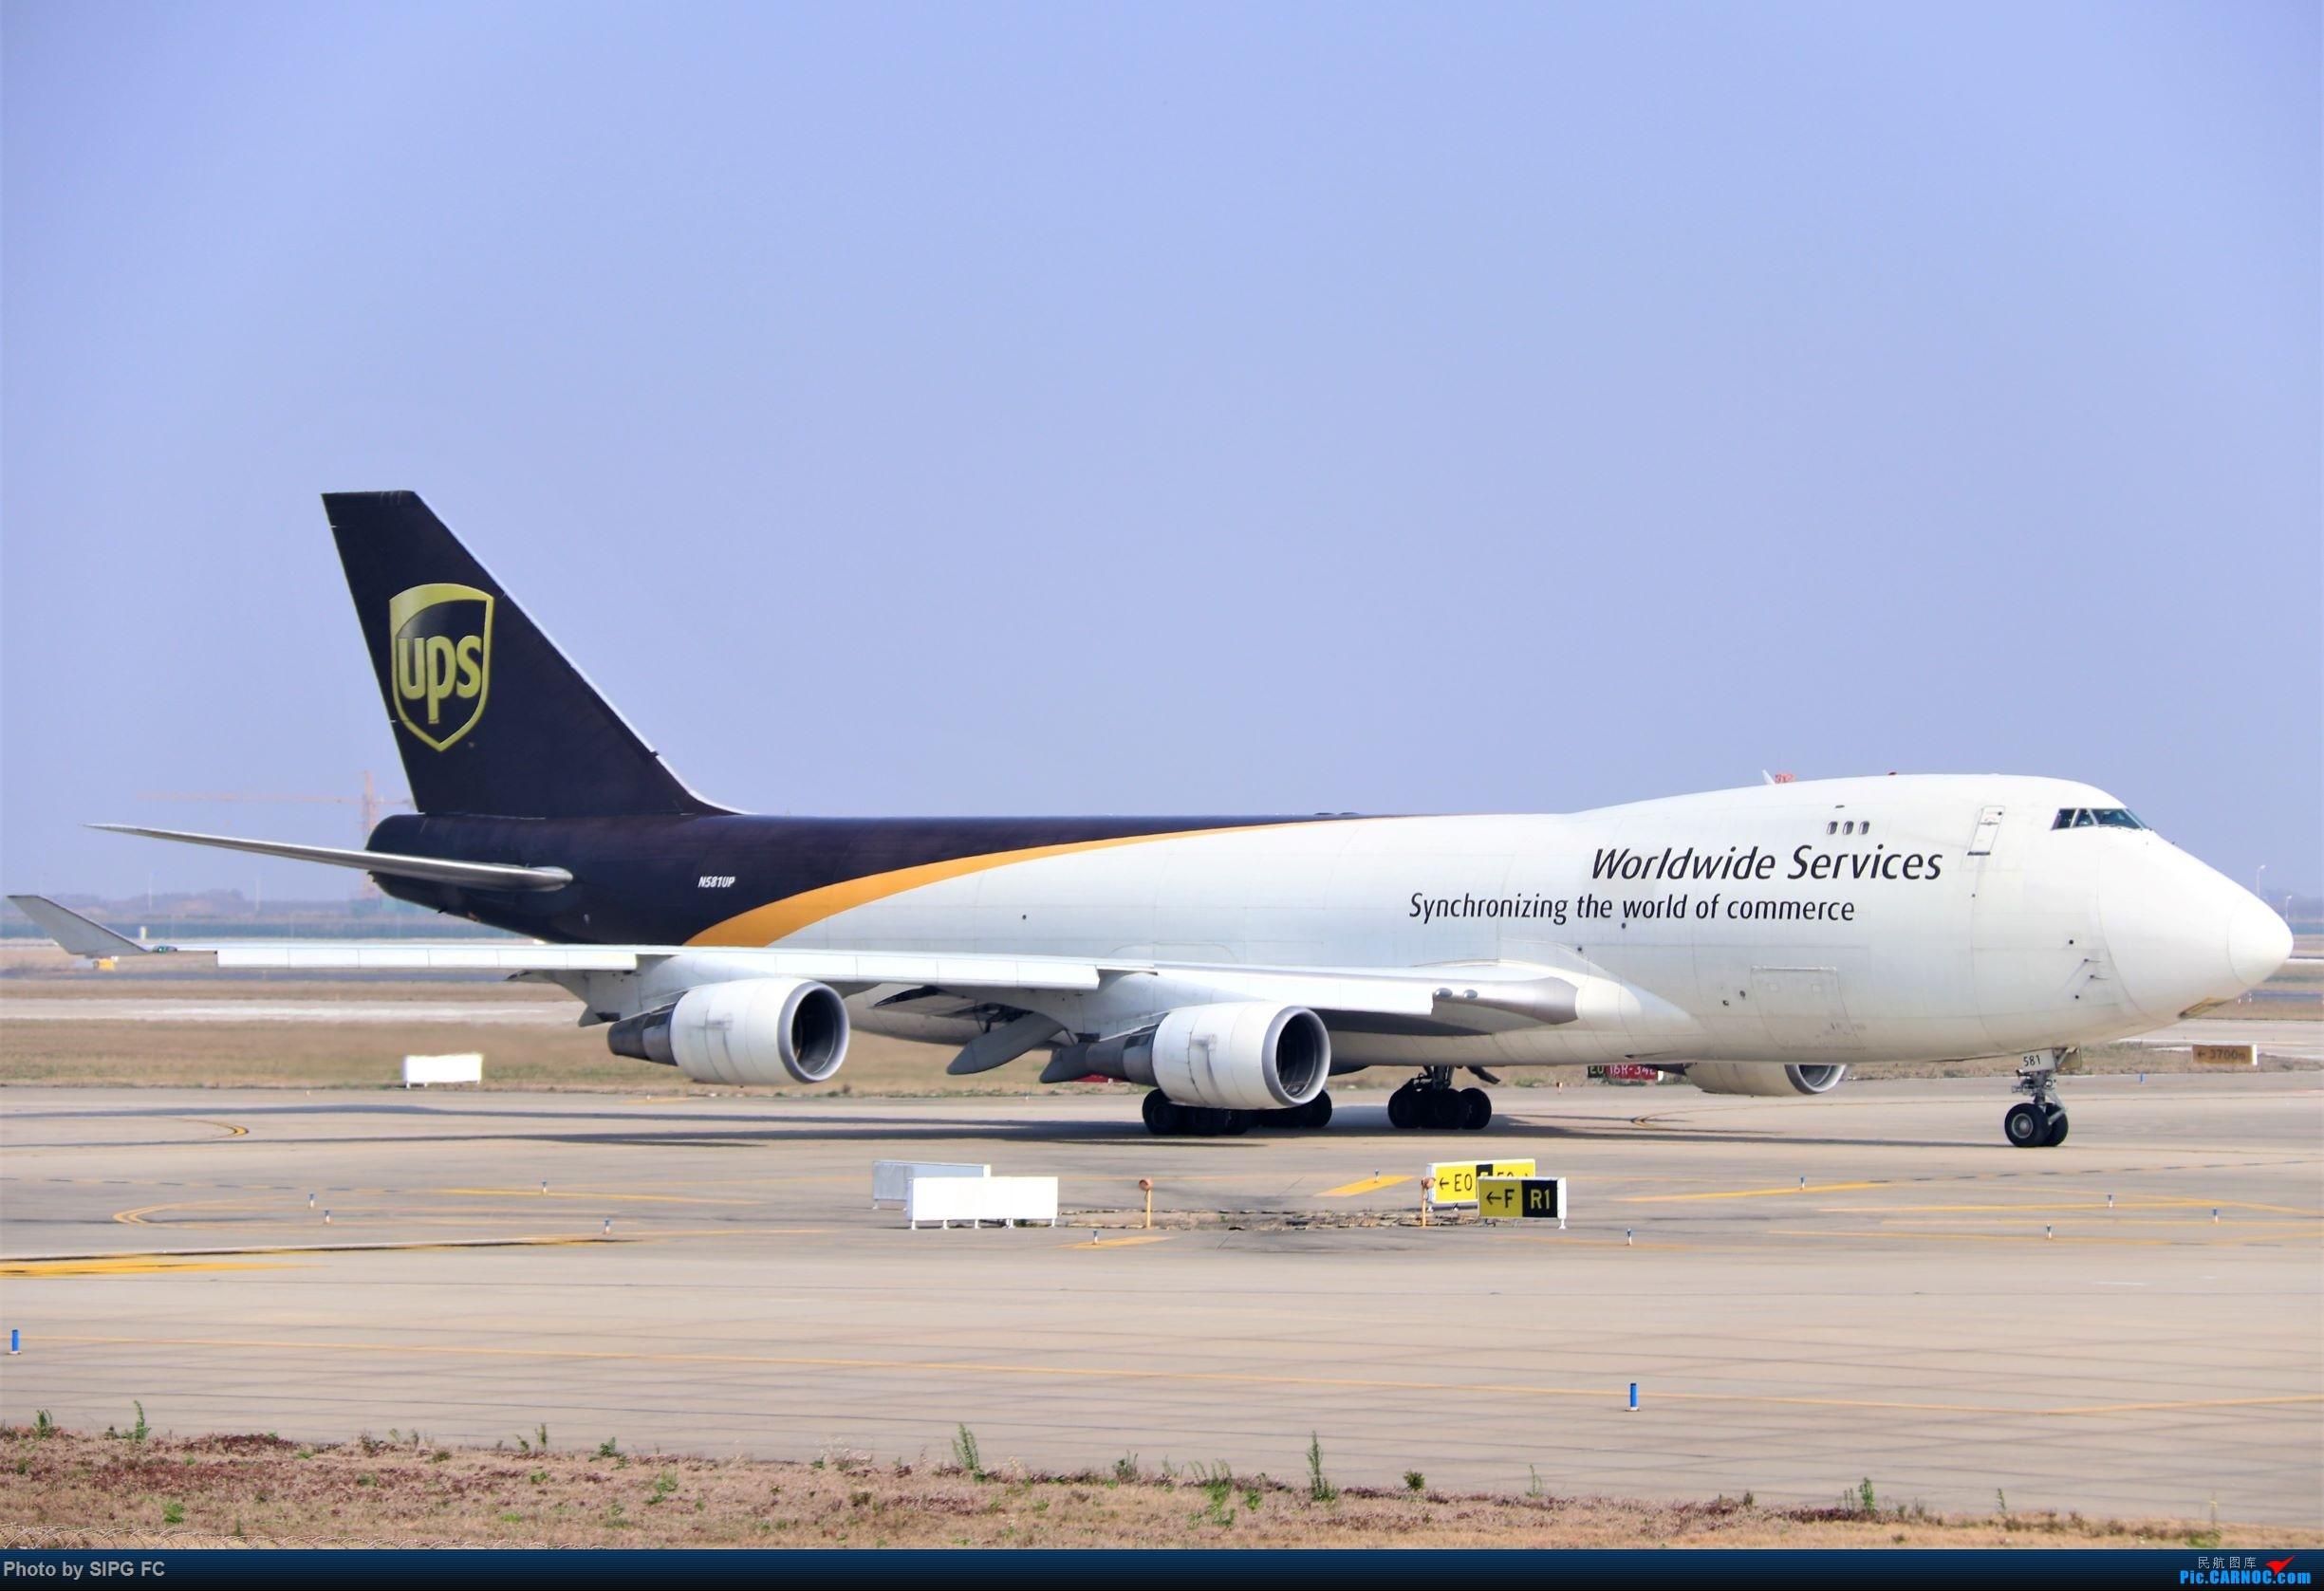 Re:[原创]清晨浓雾散去后繁忙的浦东机场 BOEING 747-400ERF N-581UP 中国上海浦东国际机场